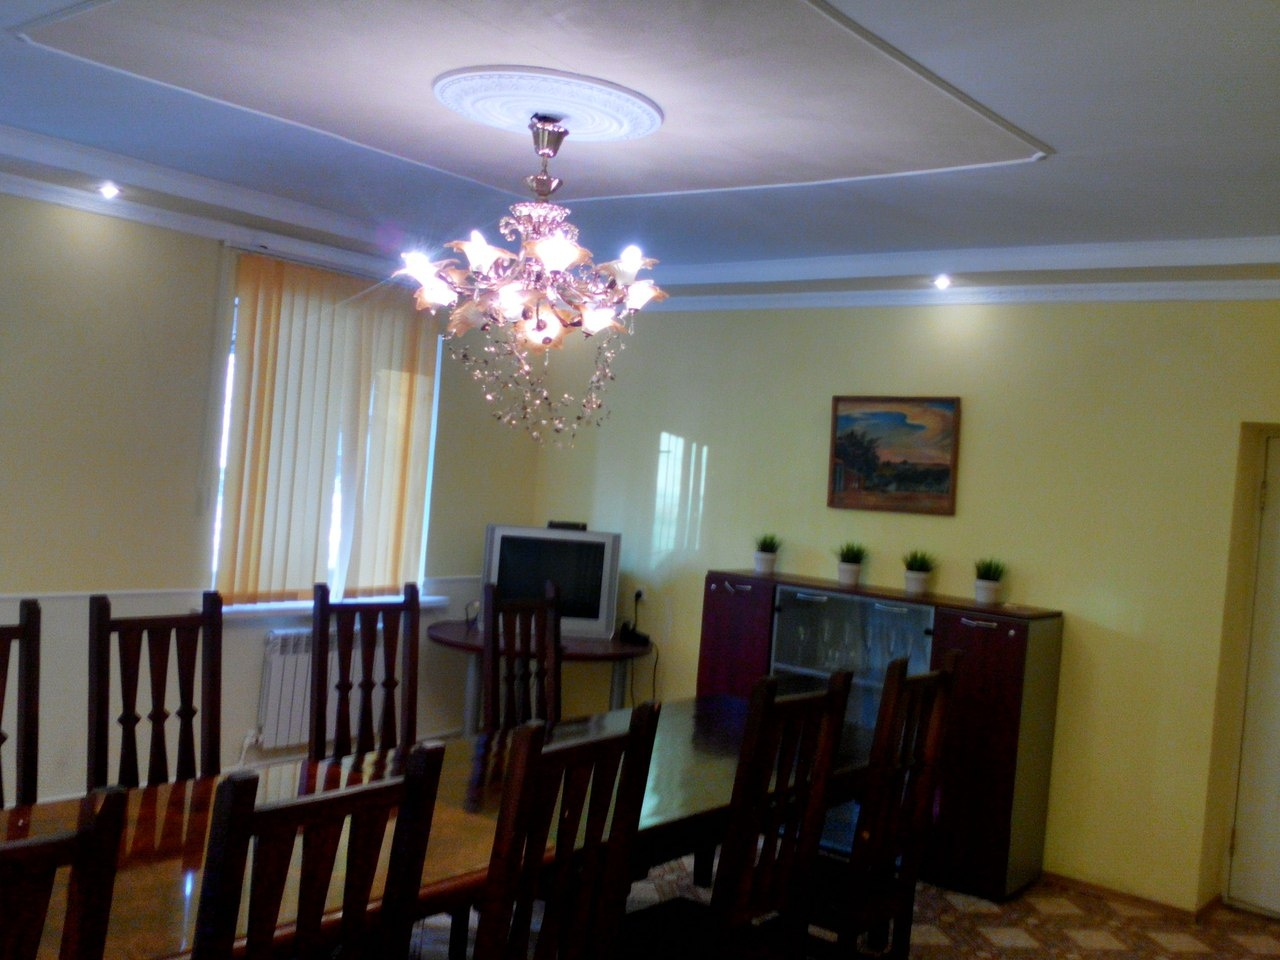 Дом отдыха «Берсут» Республика Татарстан Коттедж, фото 6